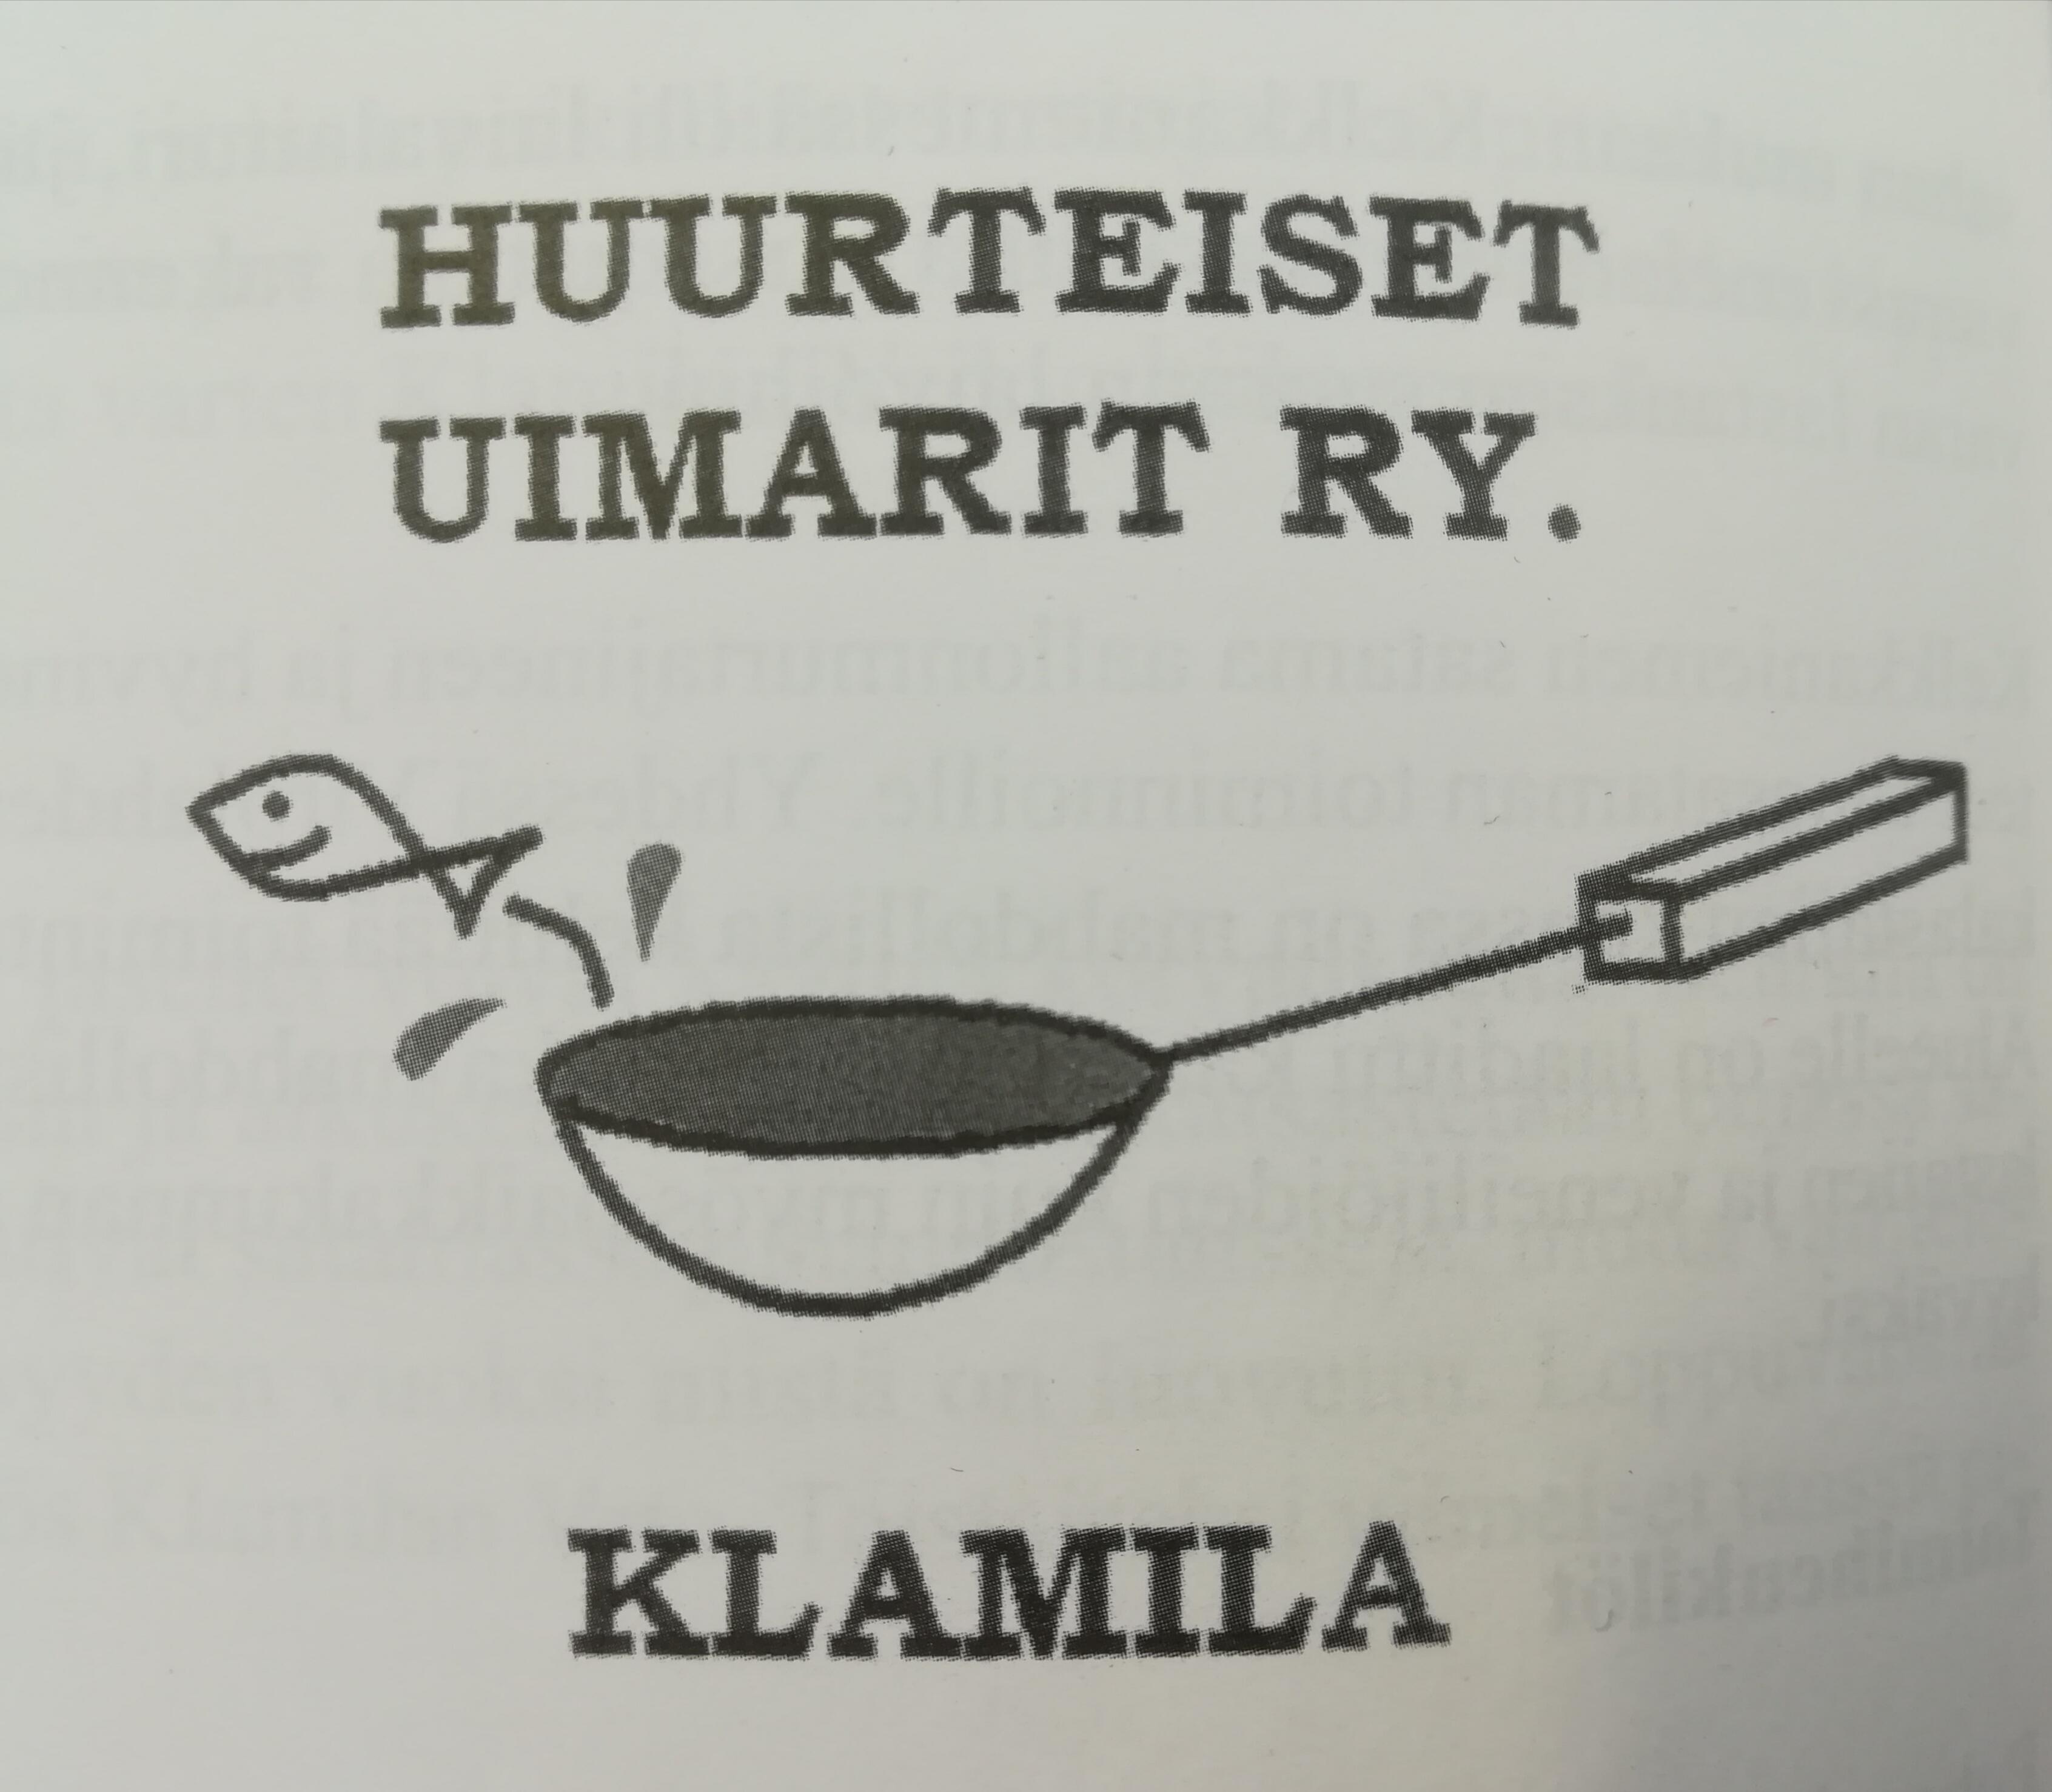 Huurteisten Uimareiden logo.